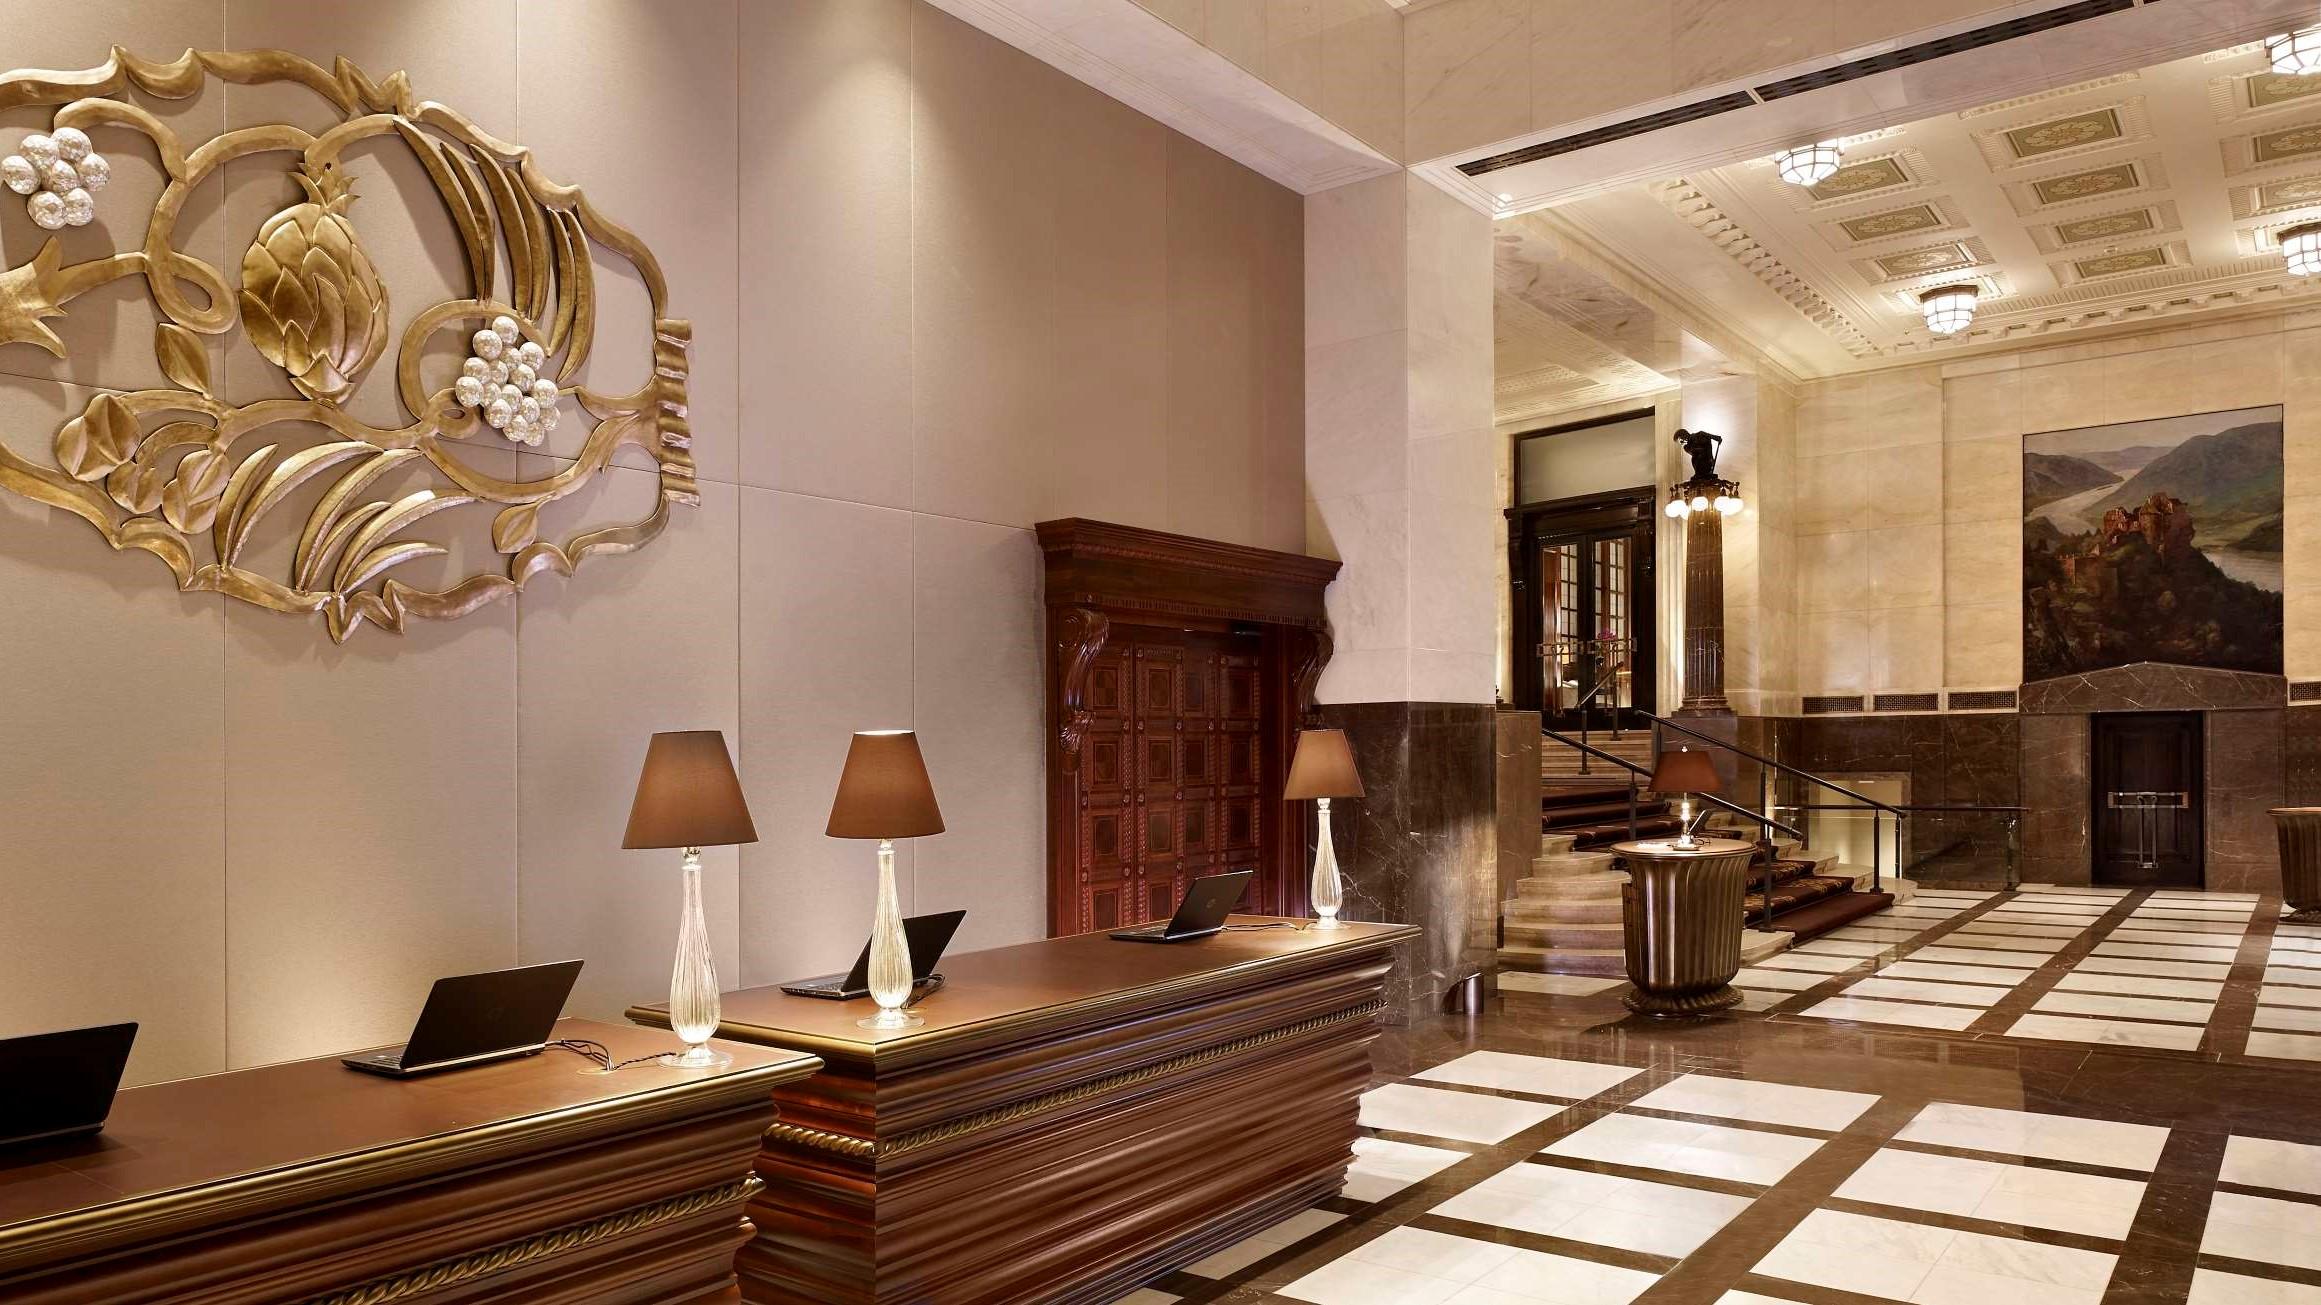 Hotel Lobby Reception Desk small.jpg